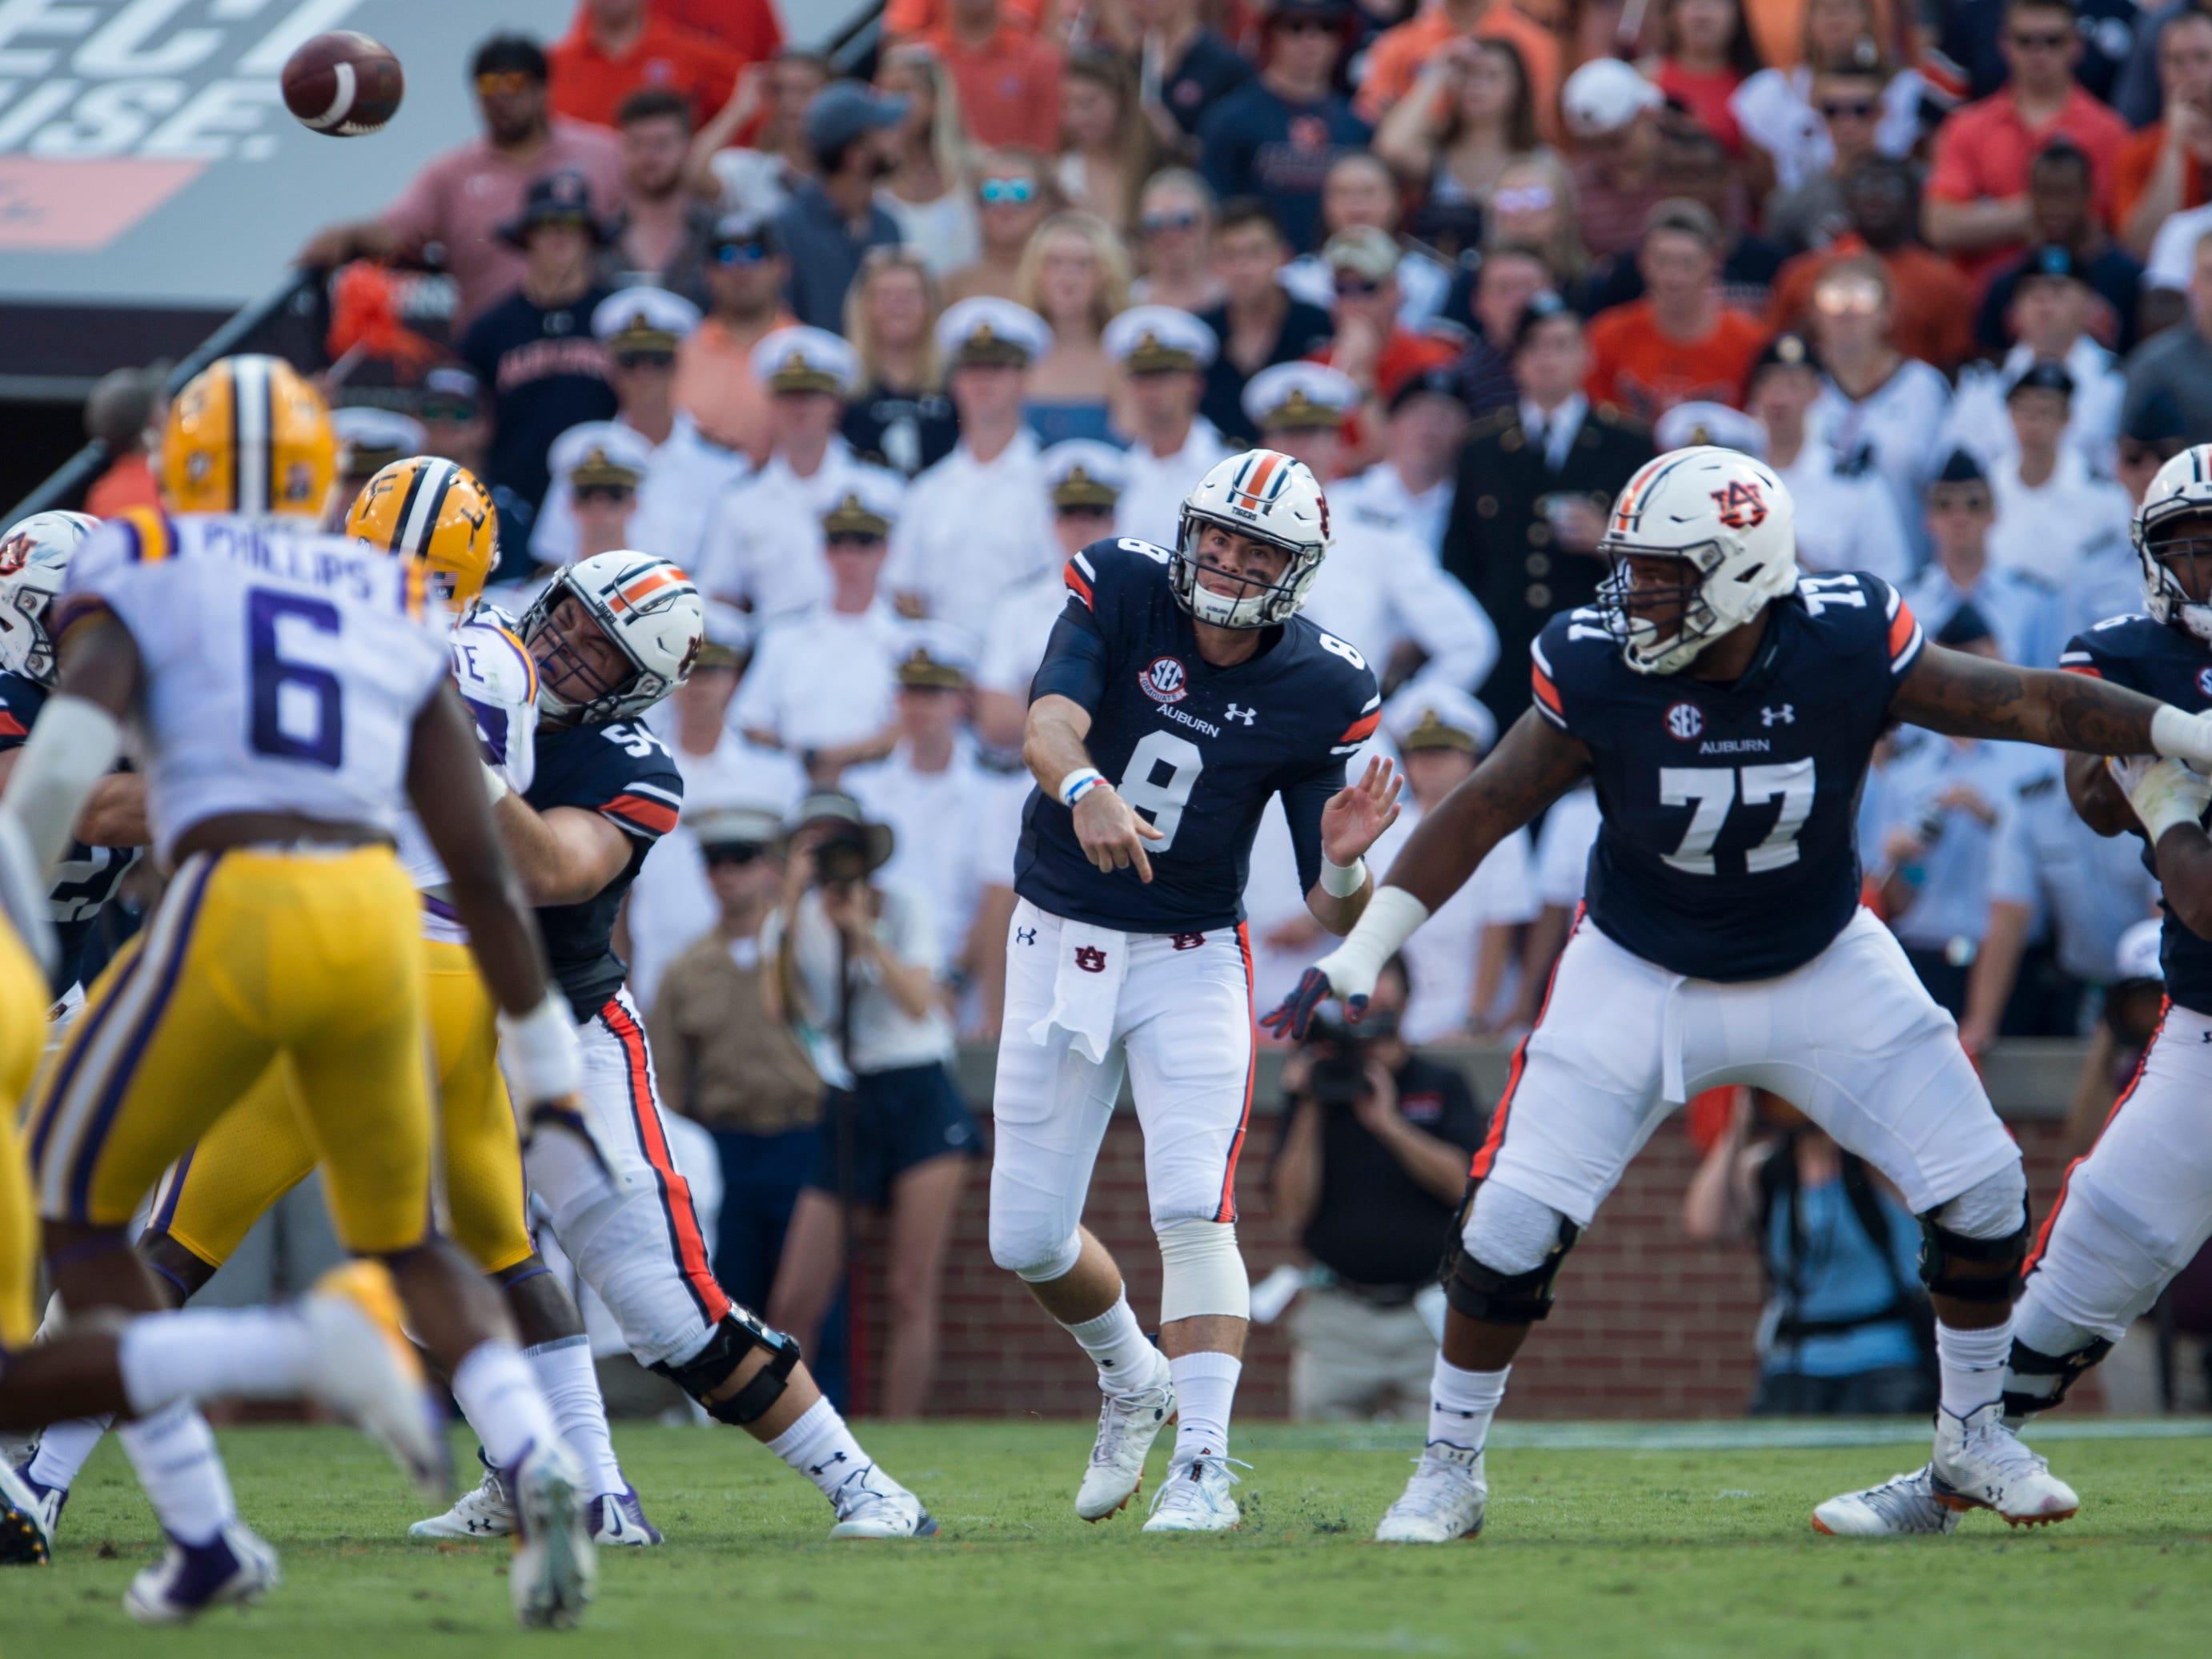 Auburn's Jarrett Stidham (8) throws the ball down field against LSU at Jordan-Hare Stadium in Auburn, Ala., on Saturday, Sept. 15, 2018. LSU defeated Auburn 22-21.